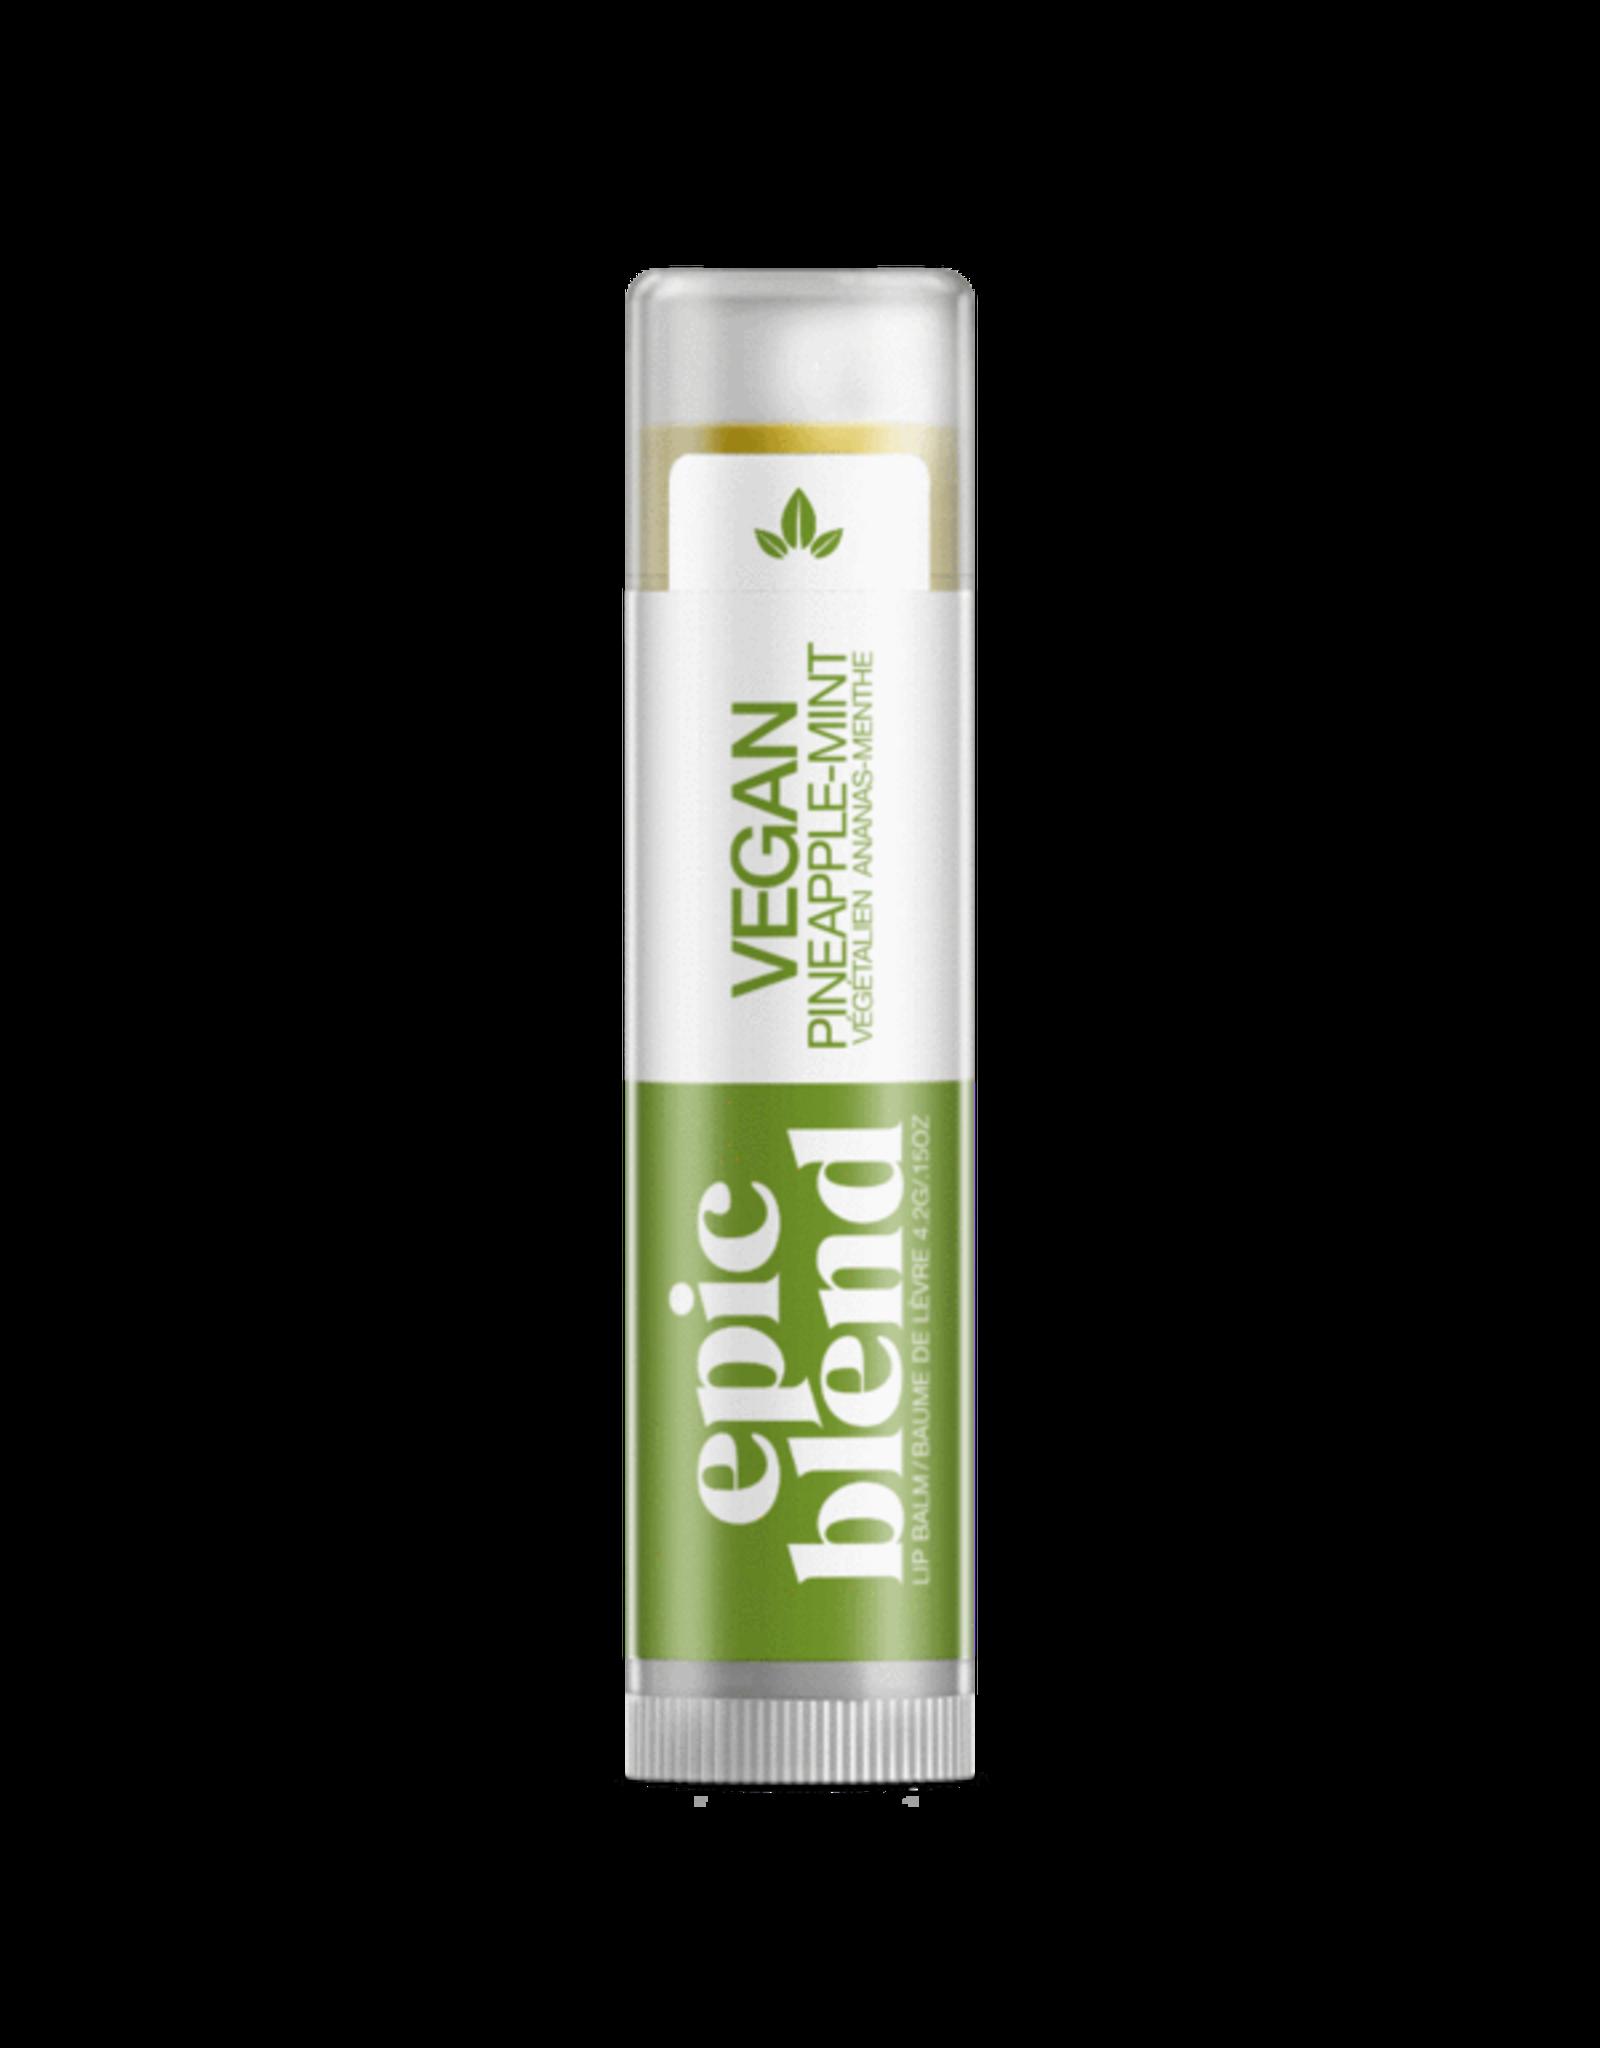 Epic Blend Pineapple-Mint Vegan Lip Balm